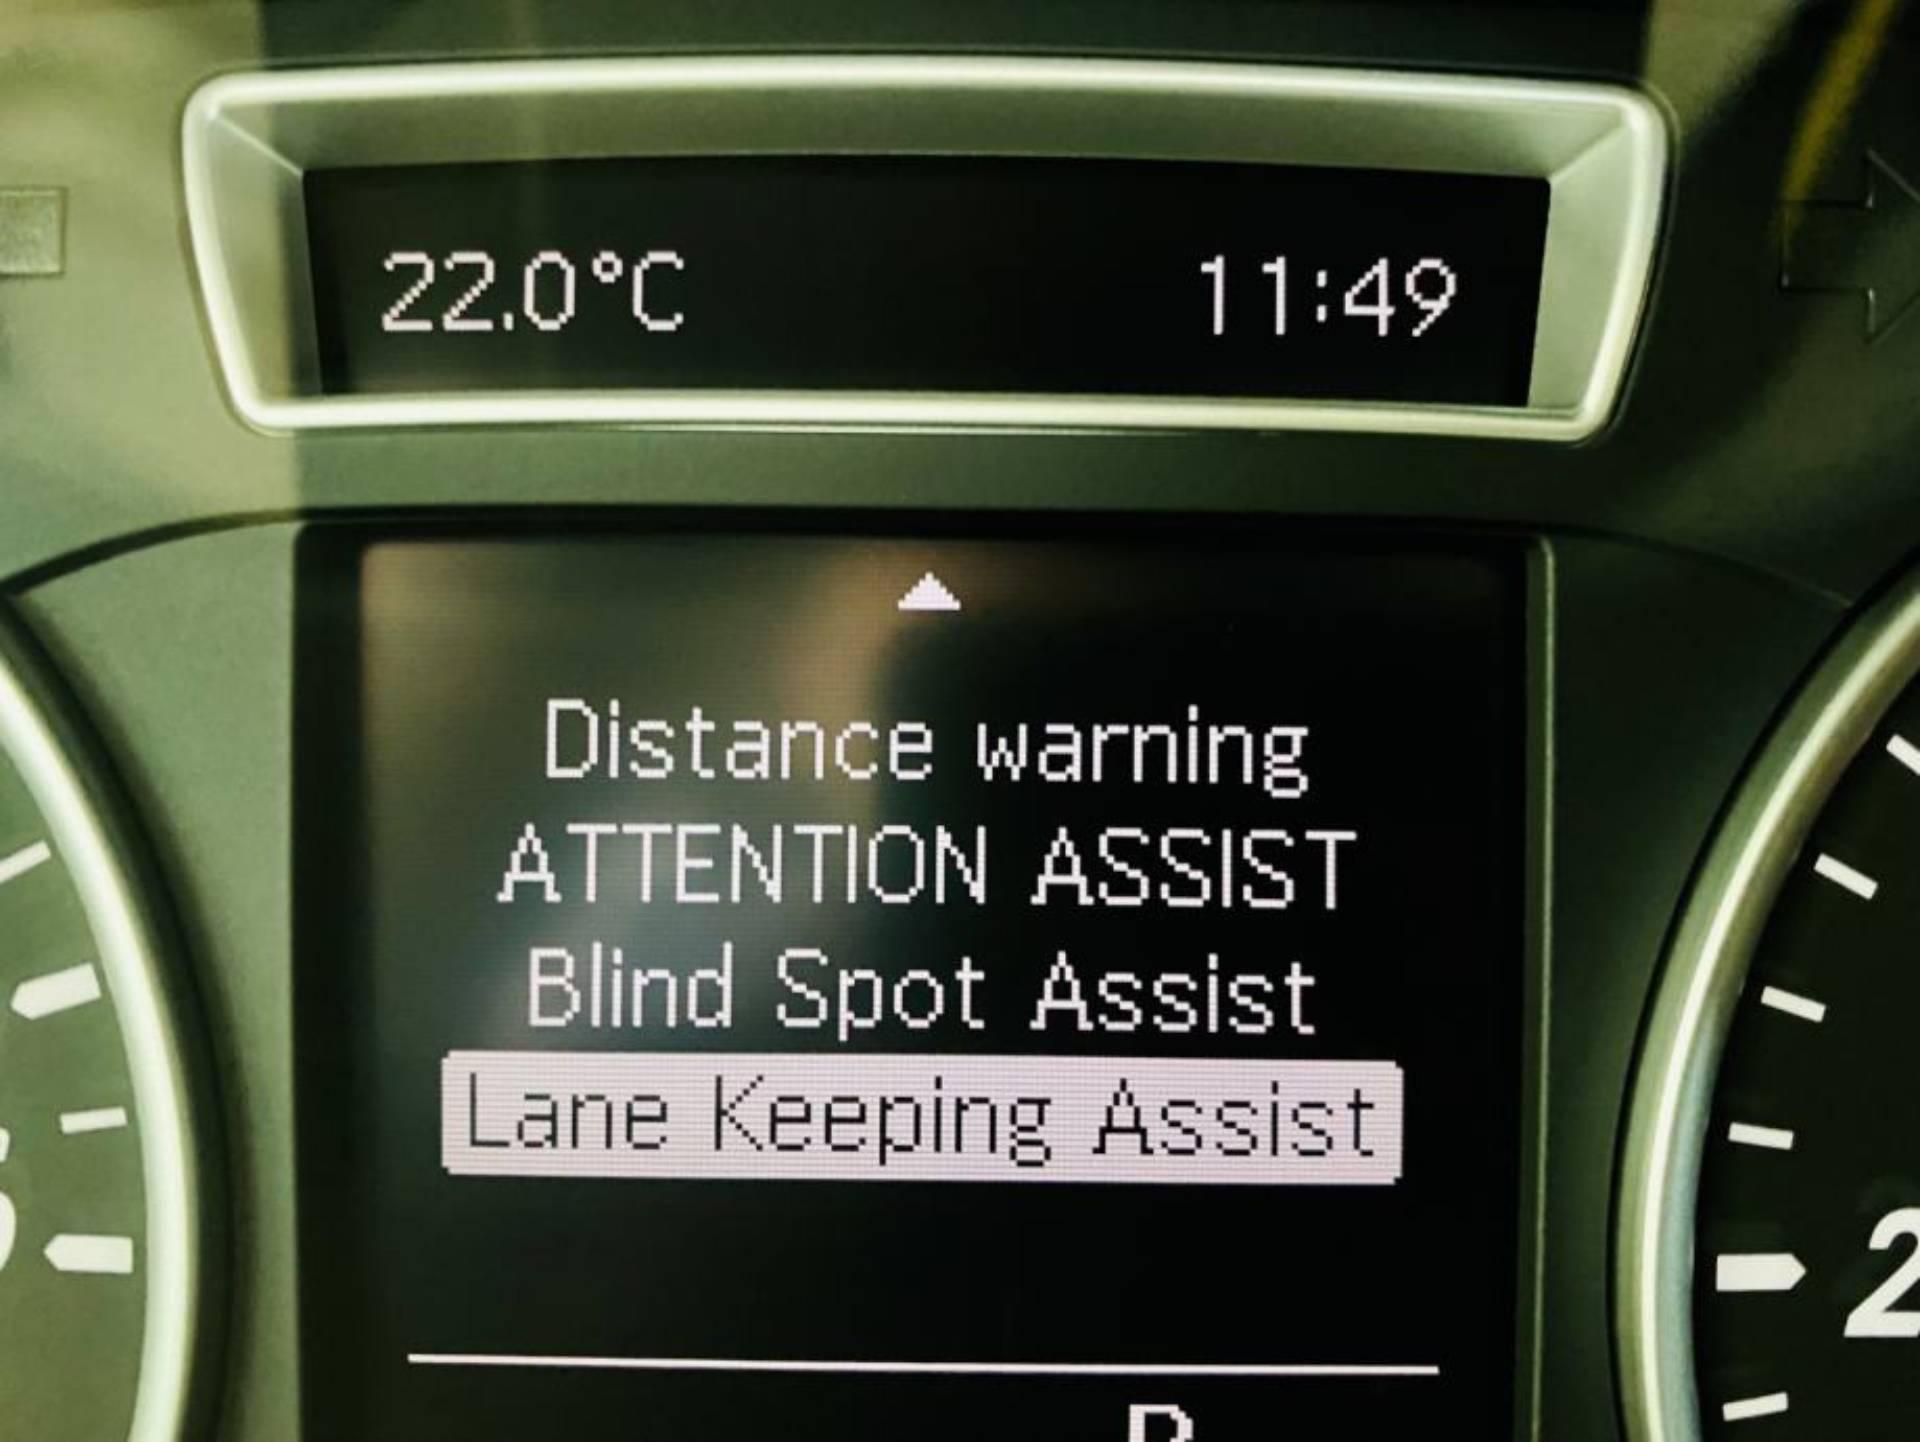 Mercedes-Benz-B-180-CDI-STYLE-7G